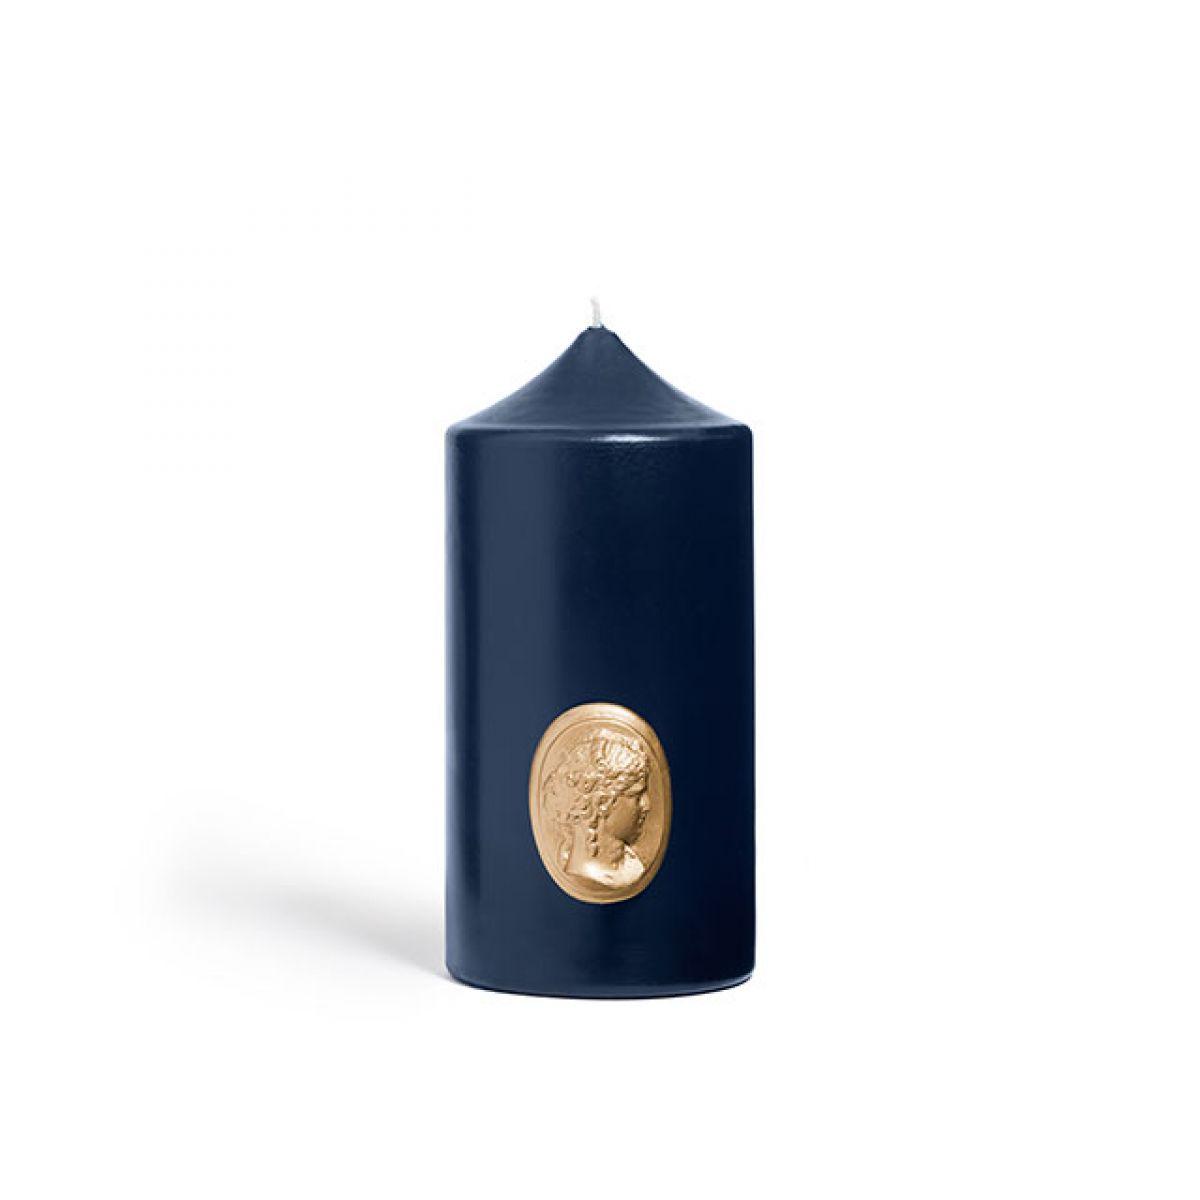 Navy blue pillar candle